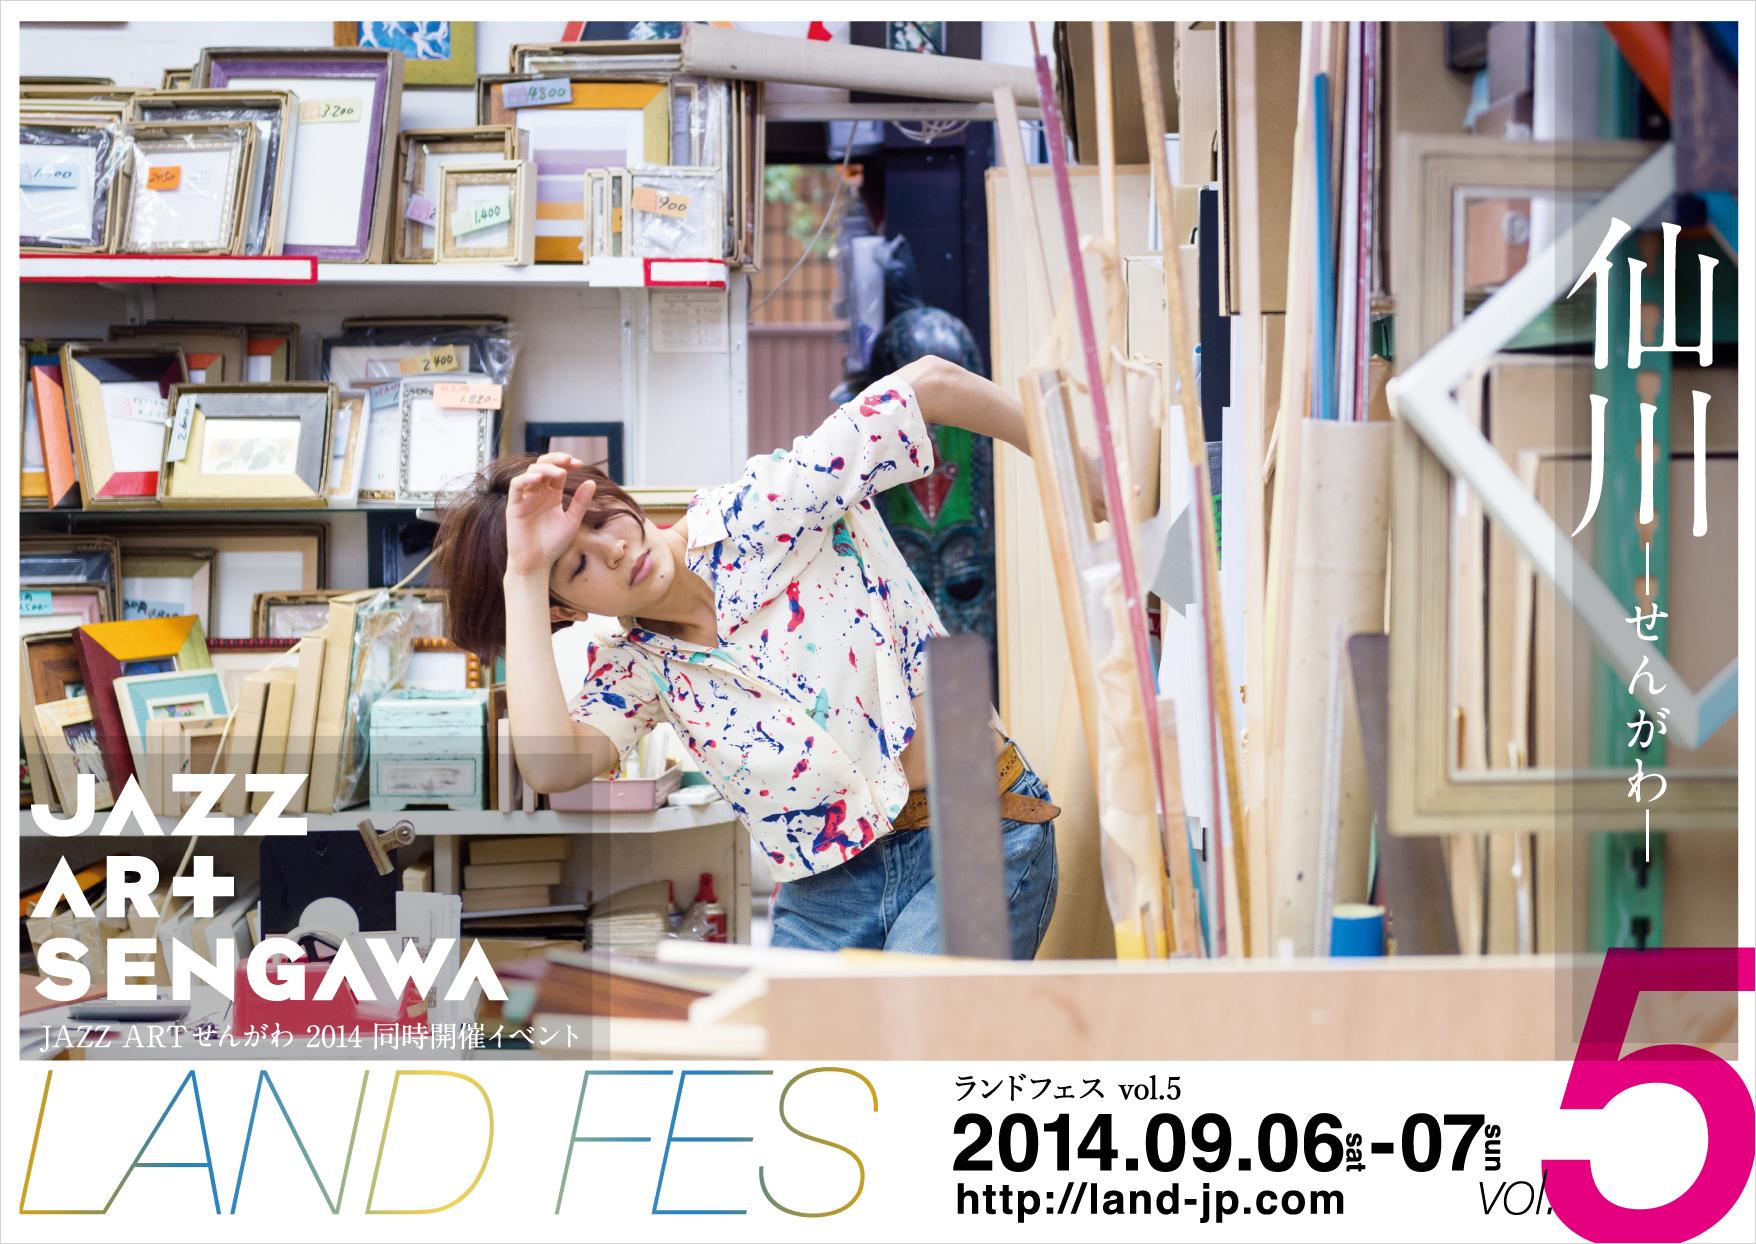 LandFes_Sengawa_C-01